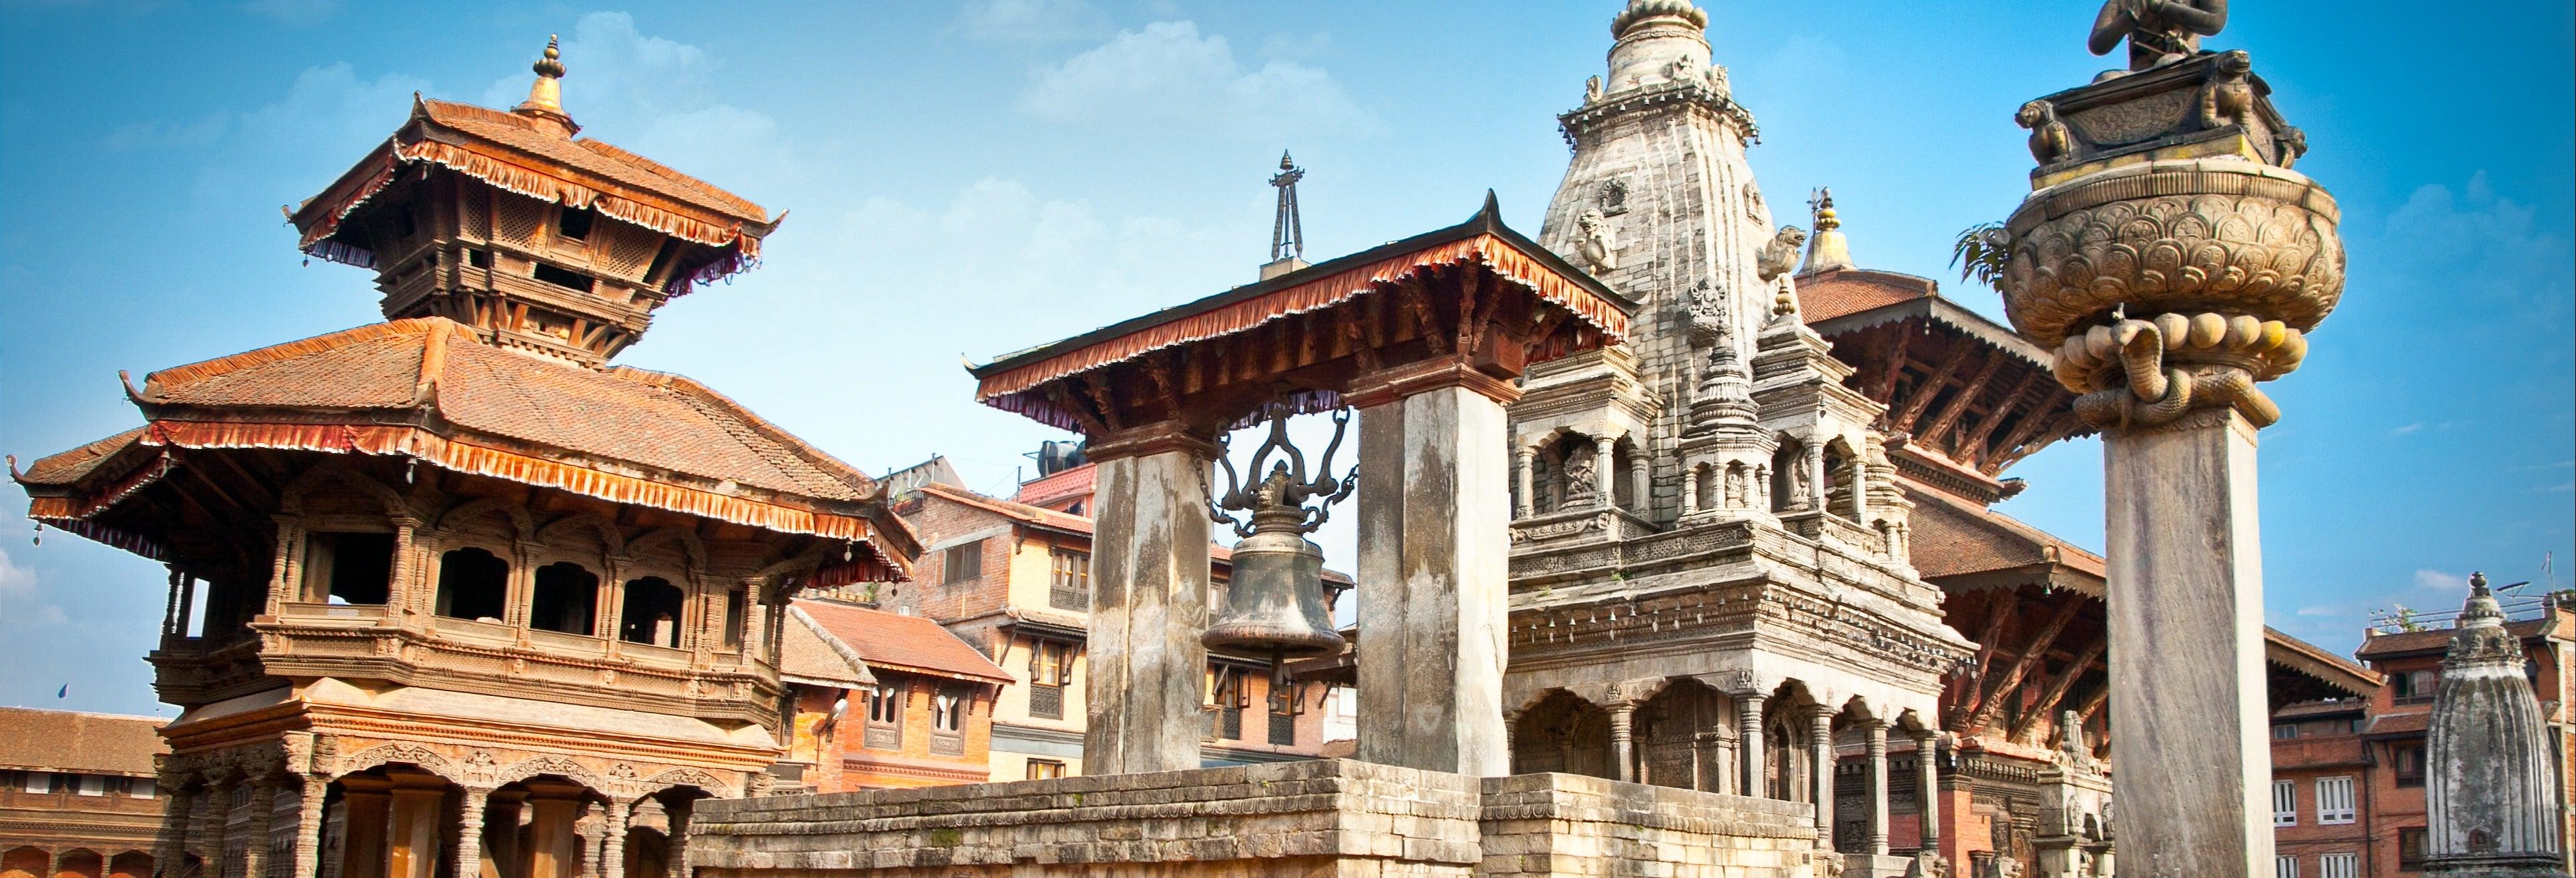 Tour nocturno en rickshaw por Katmandú